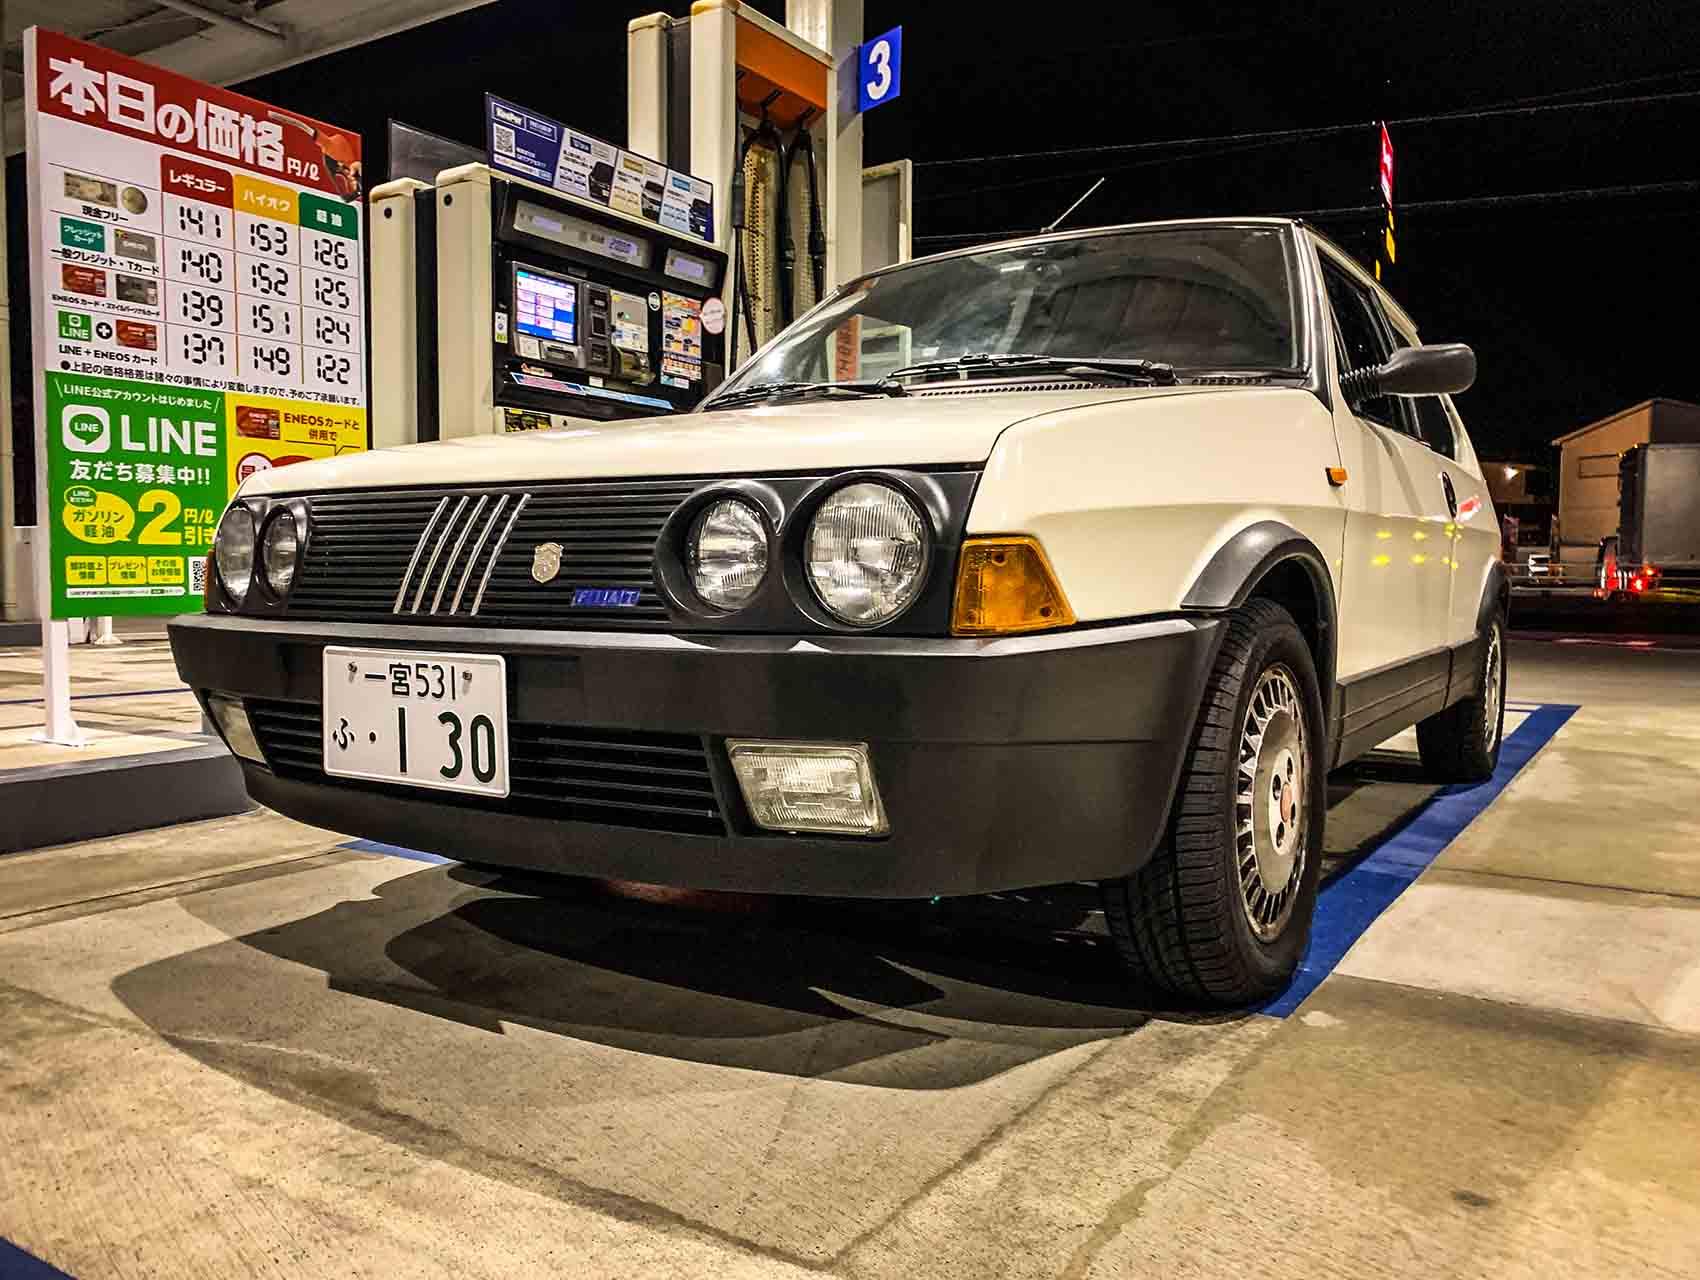 Fiat Ritmo Abarth Japan Club Italia